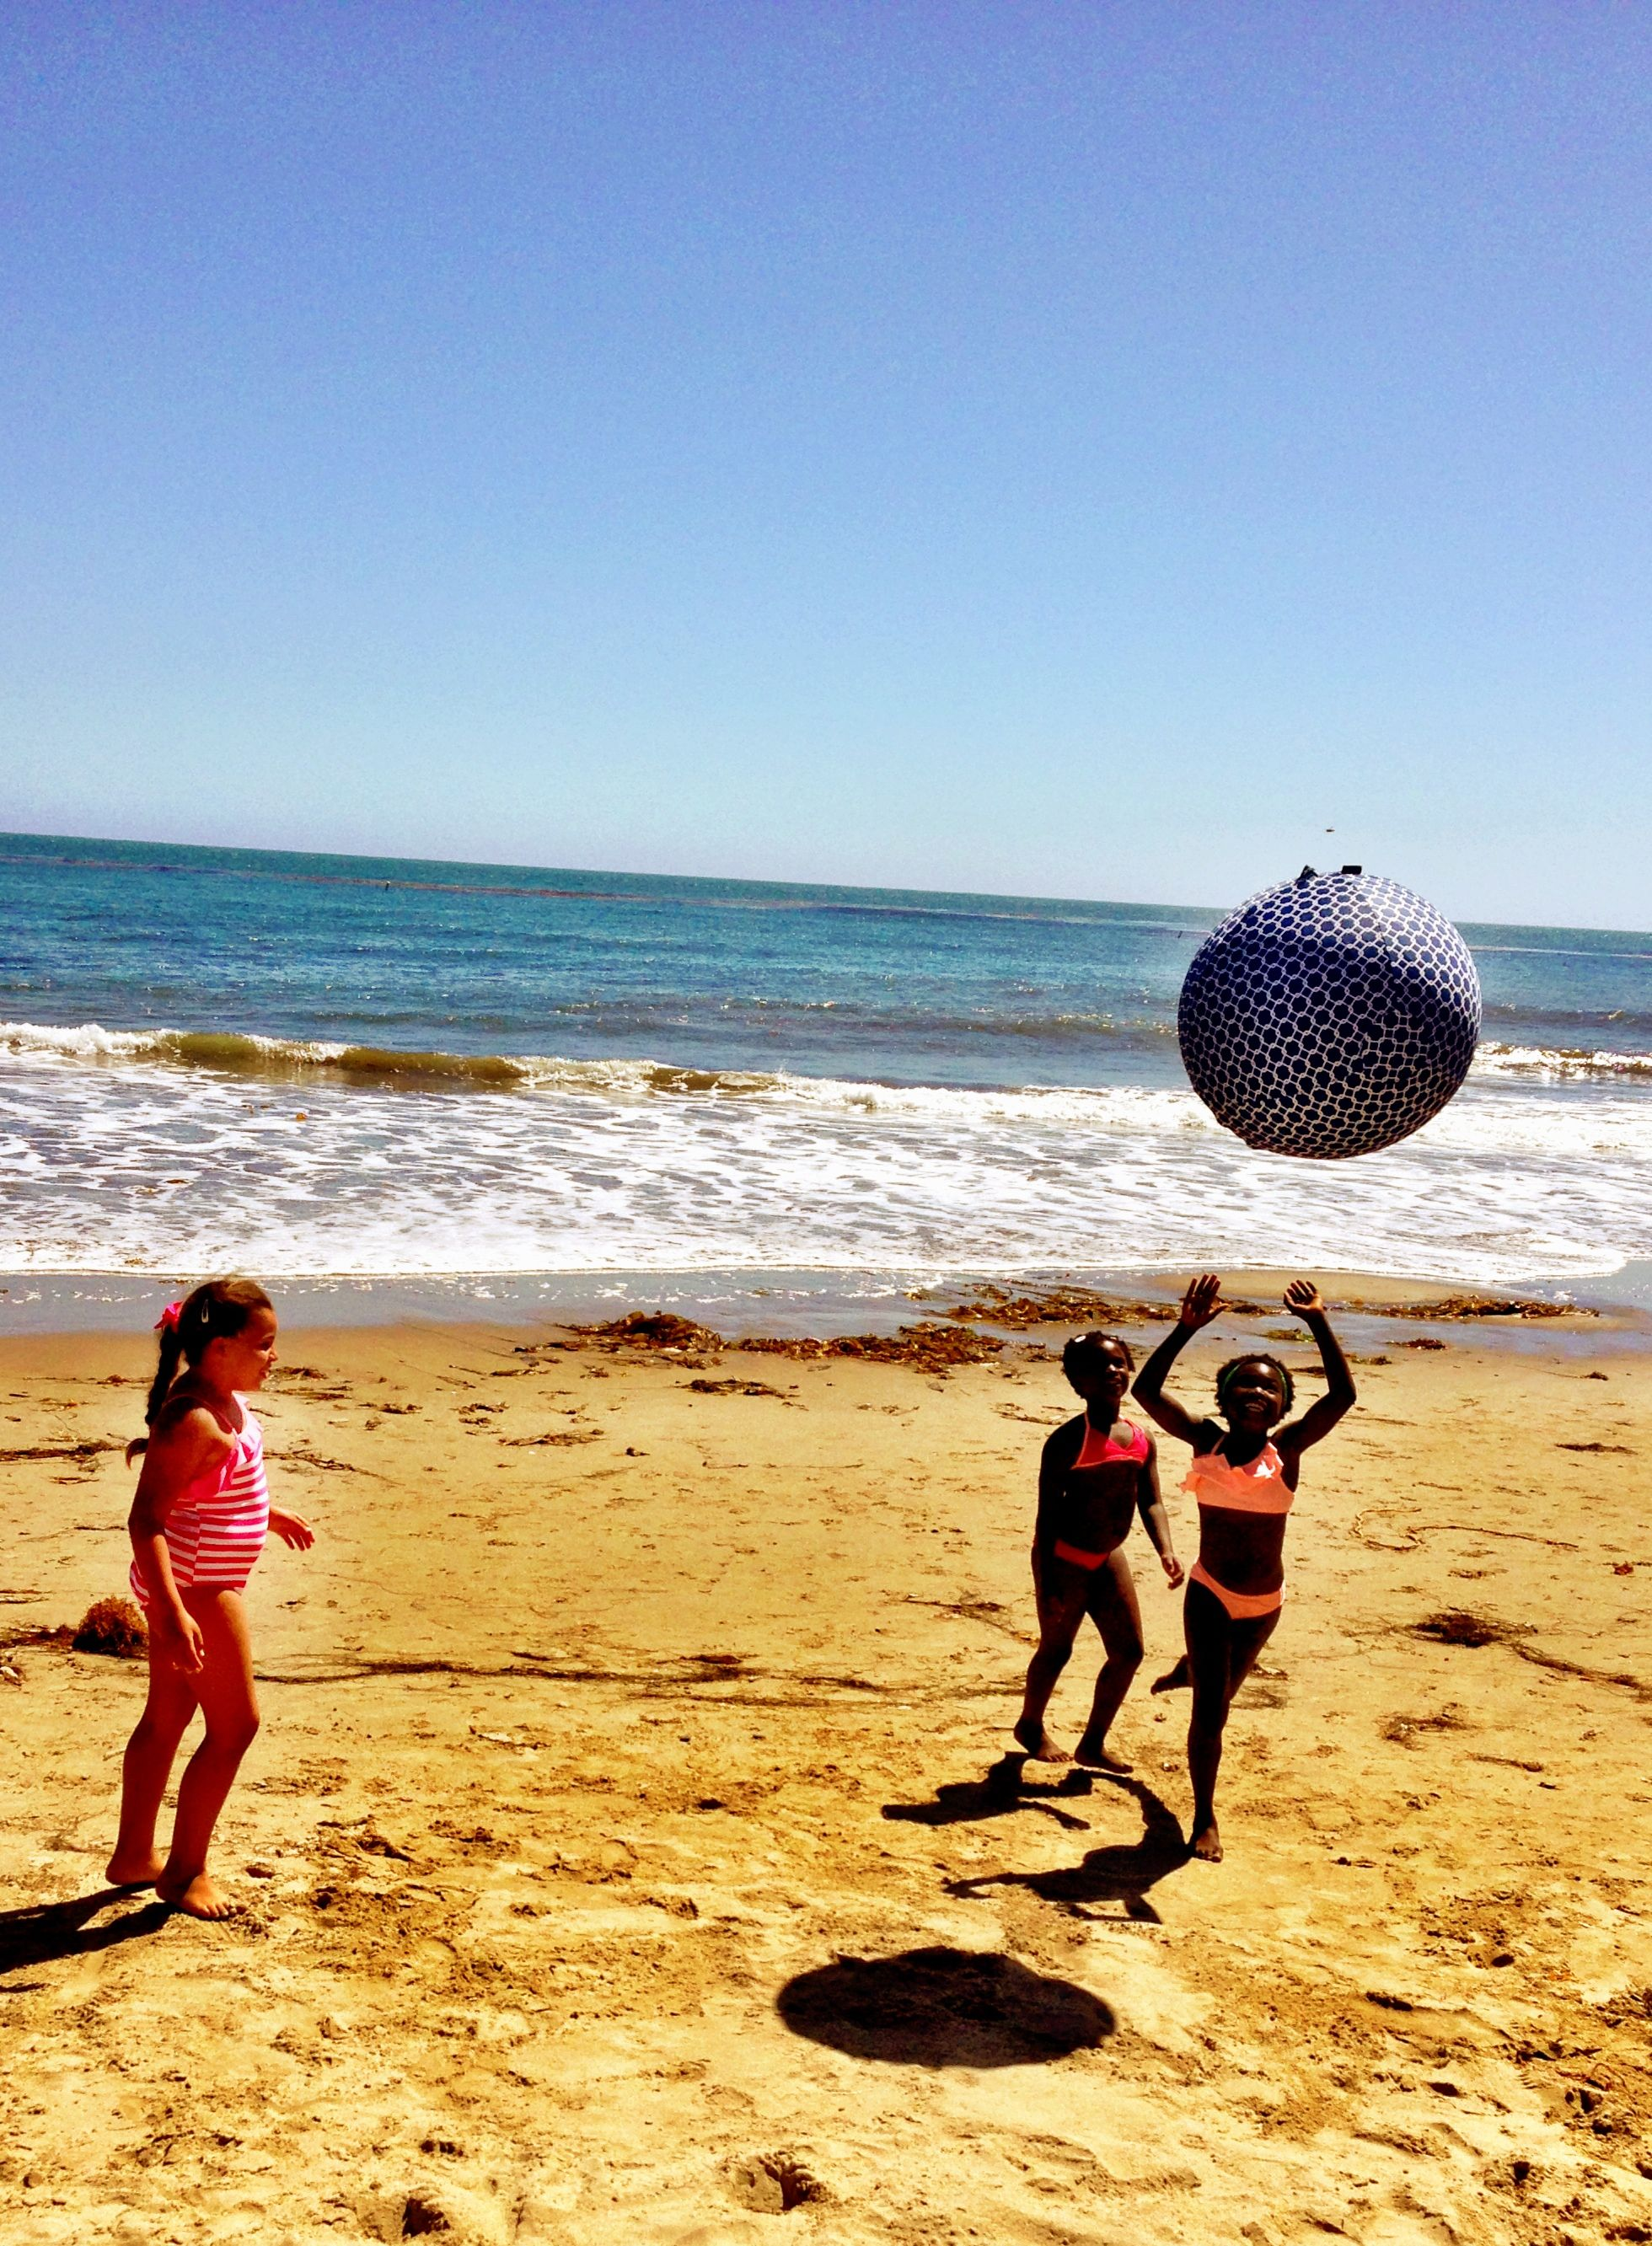 Summertime and the livin's easy.. | www.myball.co/shop  #summertime #beachfun #beach #ball #play #kids